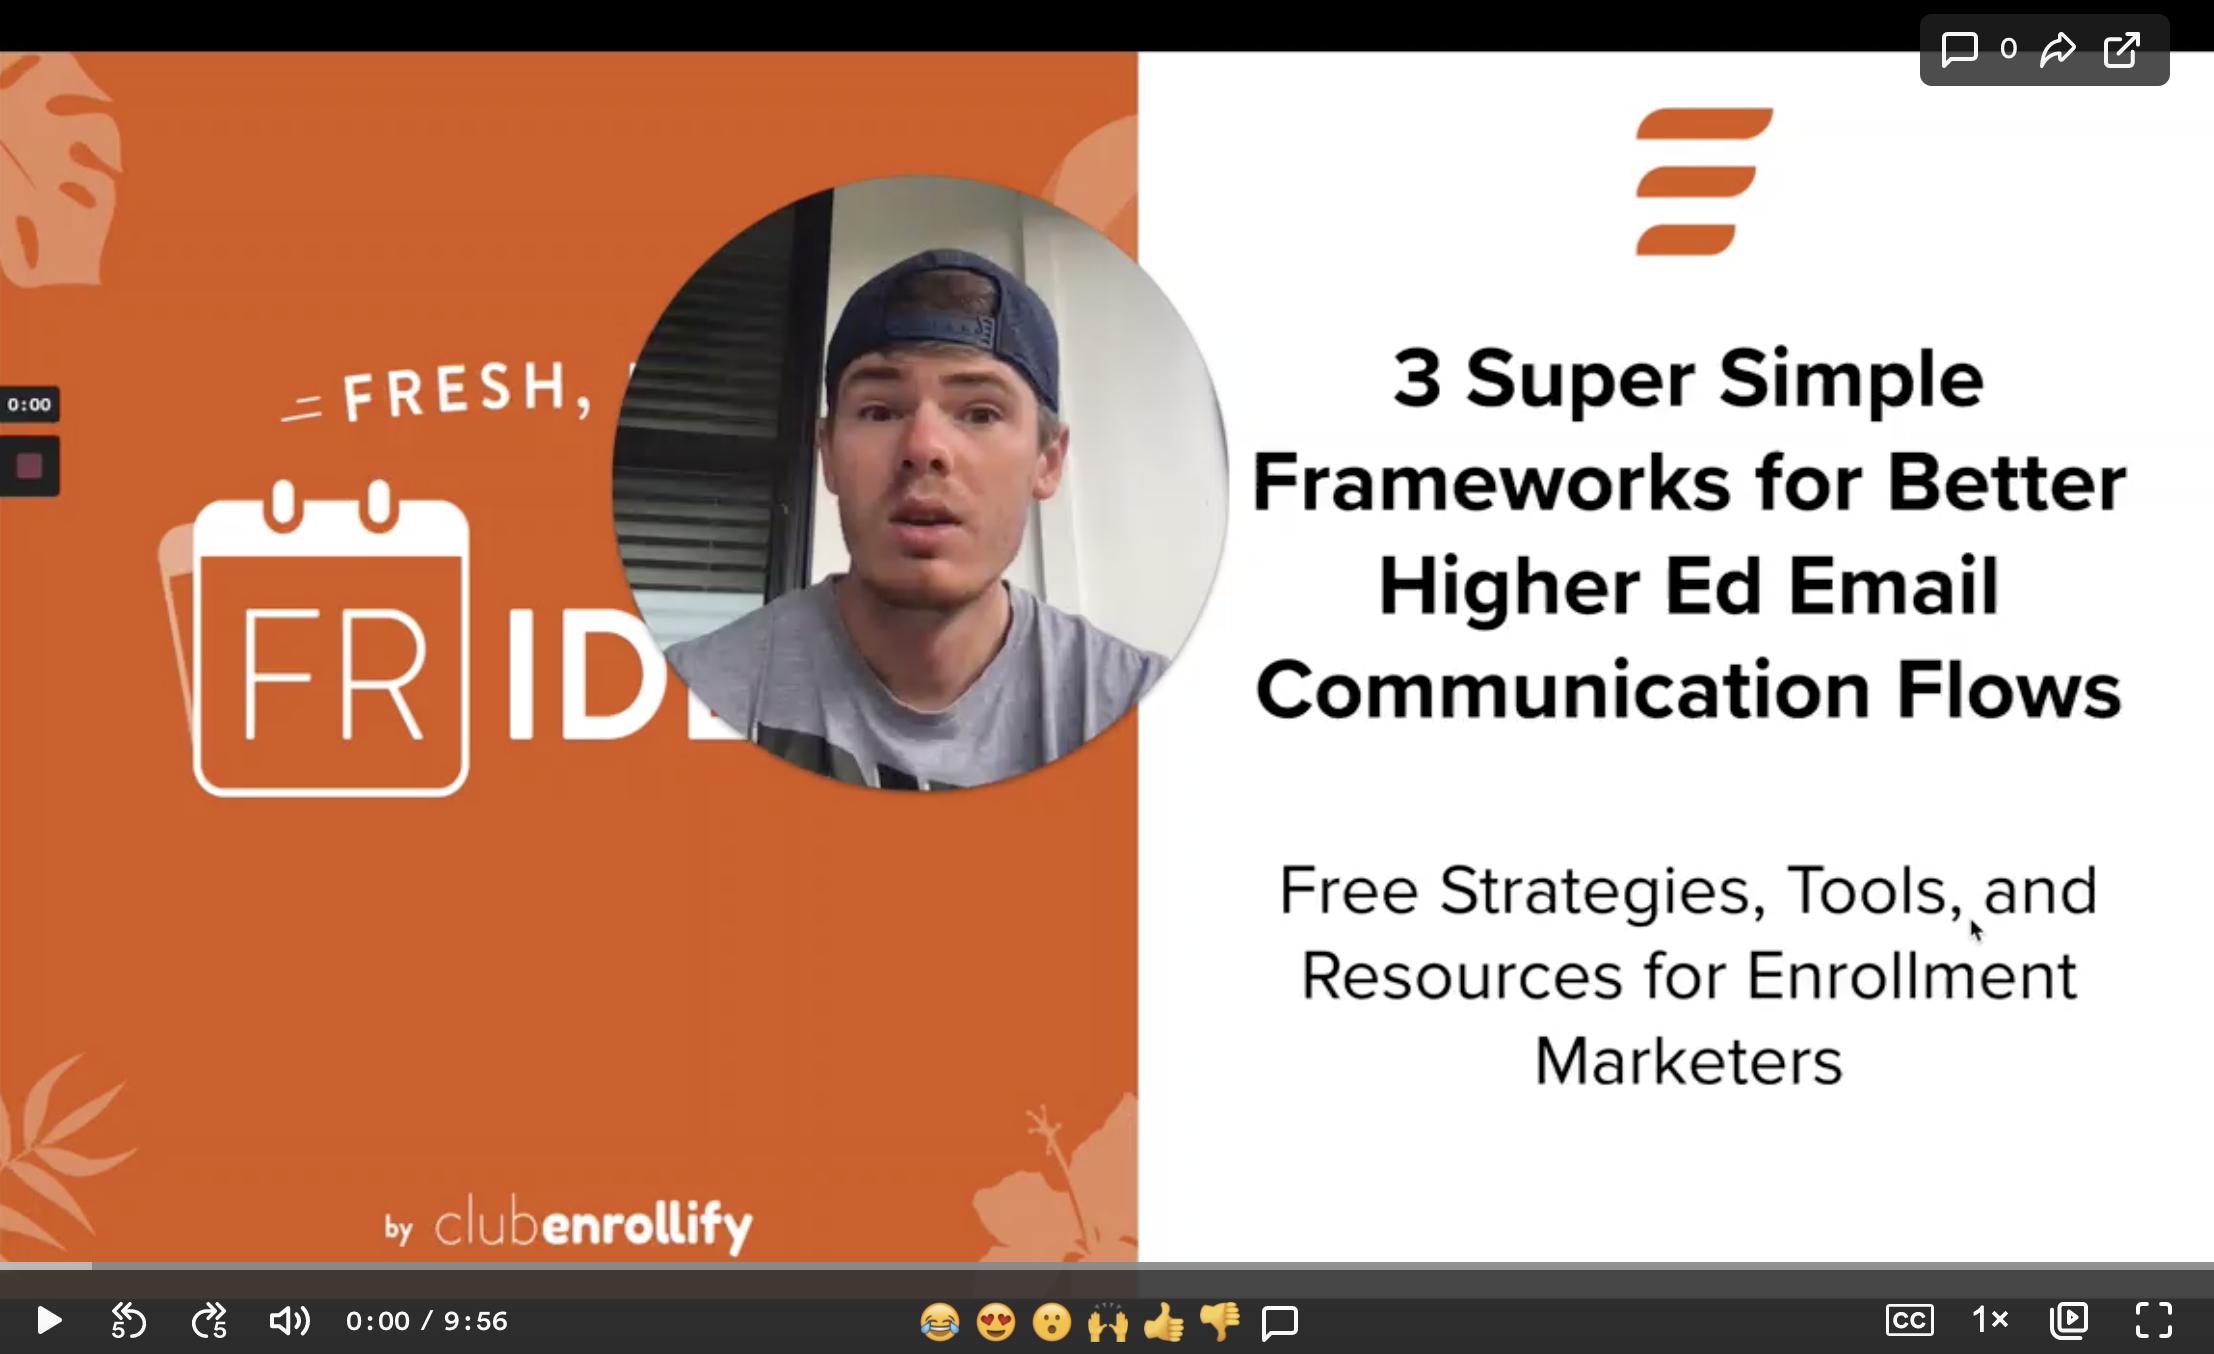 3 Frameworks for Higher Ed Email Communication Flows